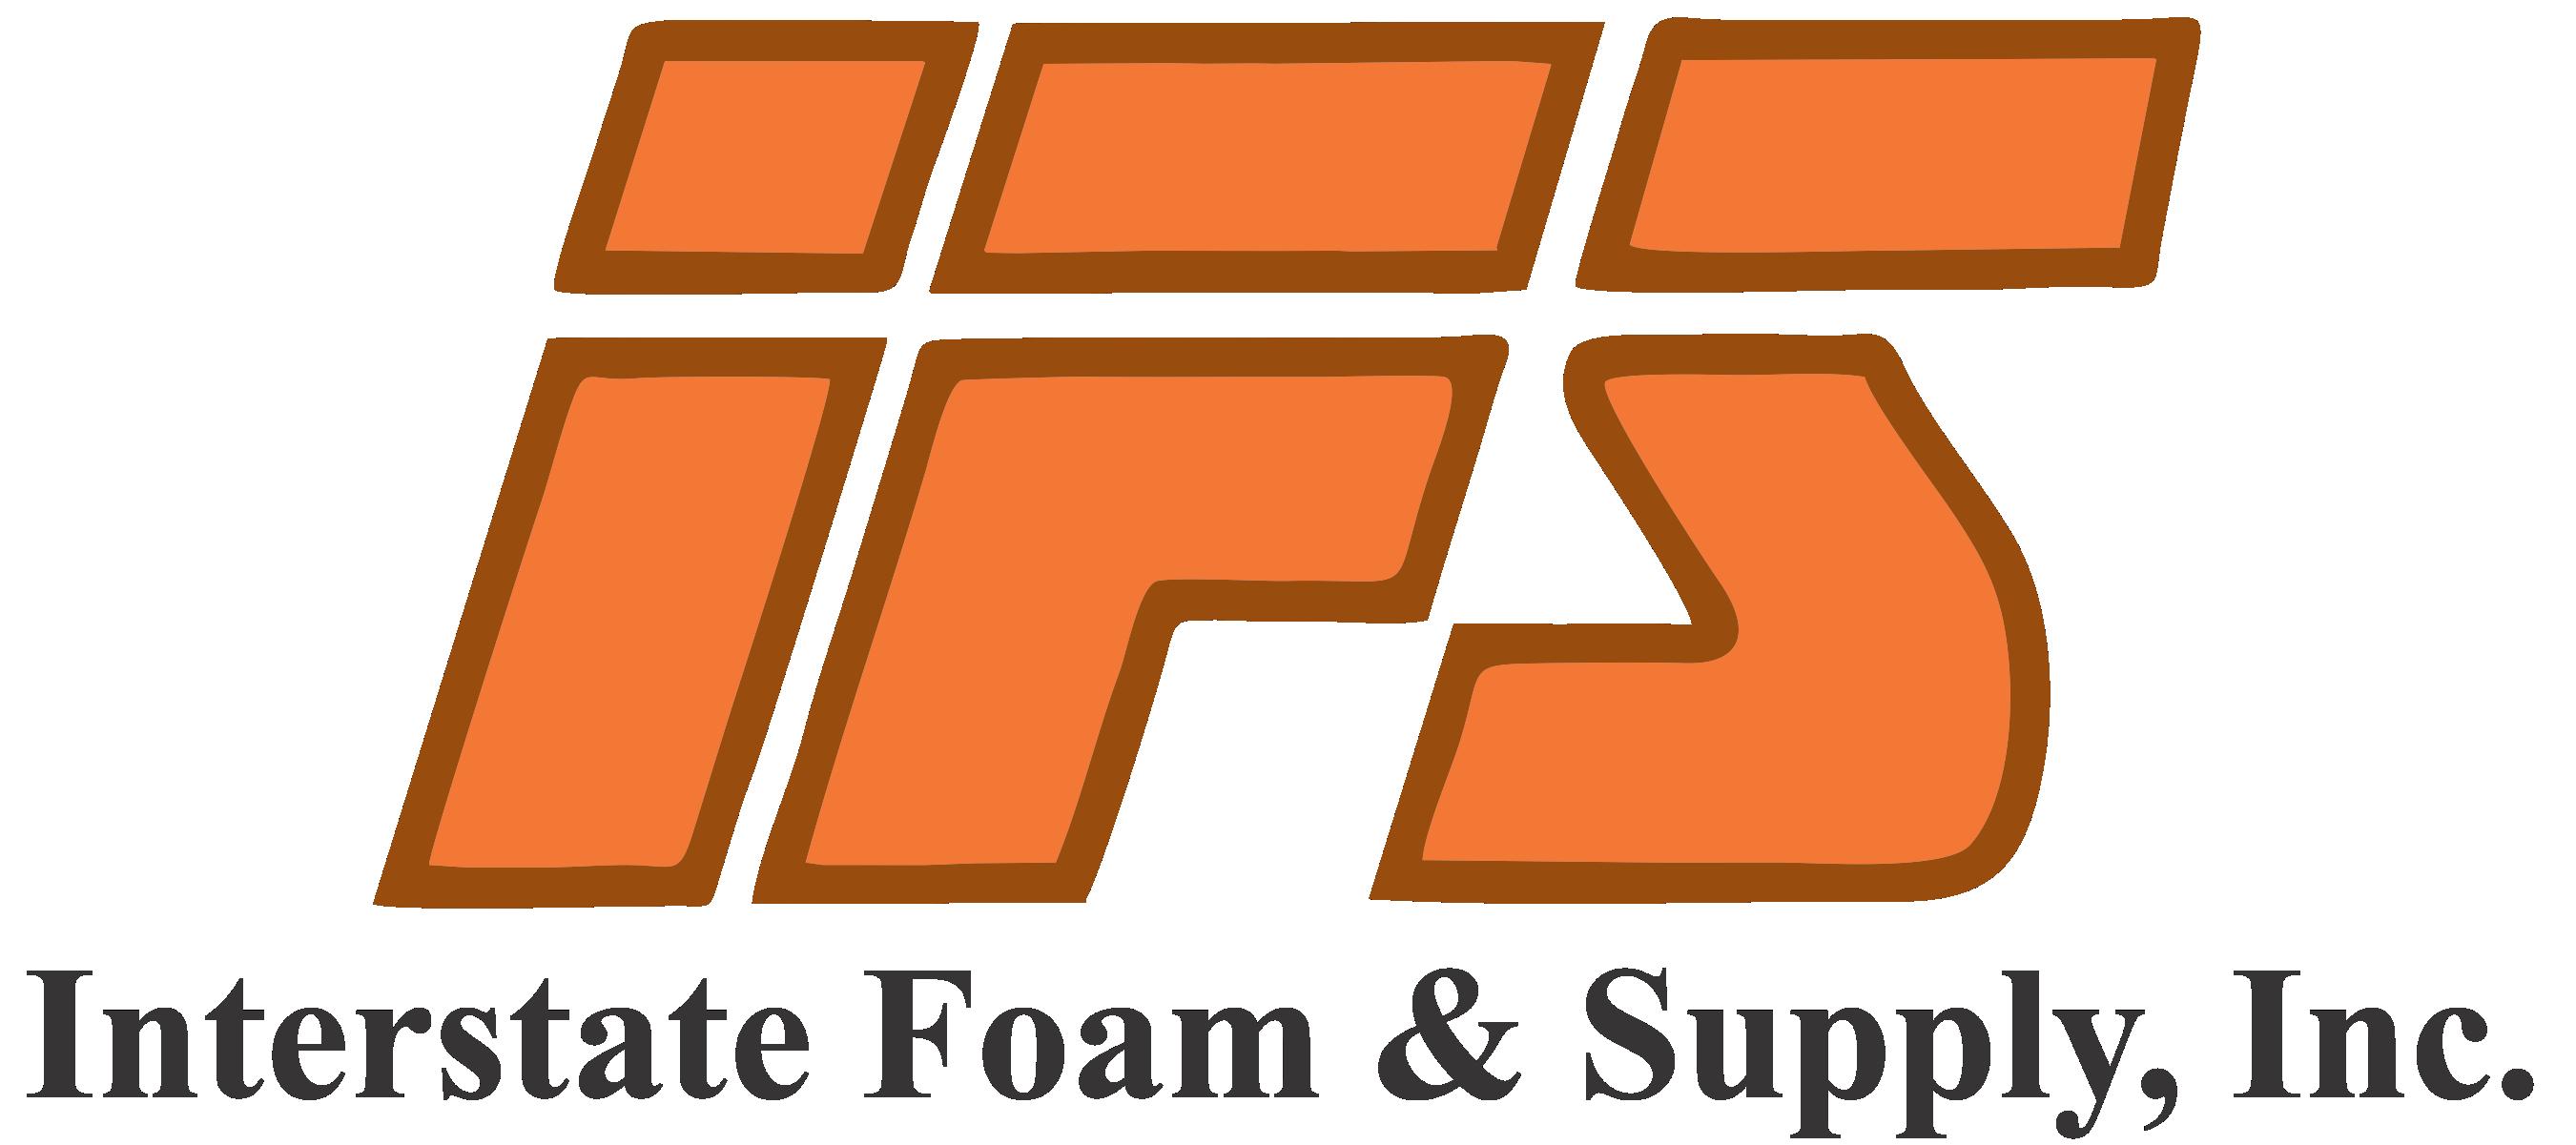 IFS Logo (1)